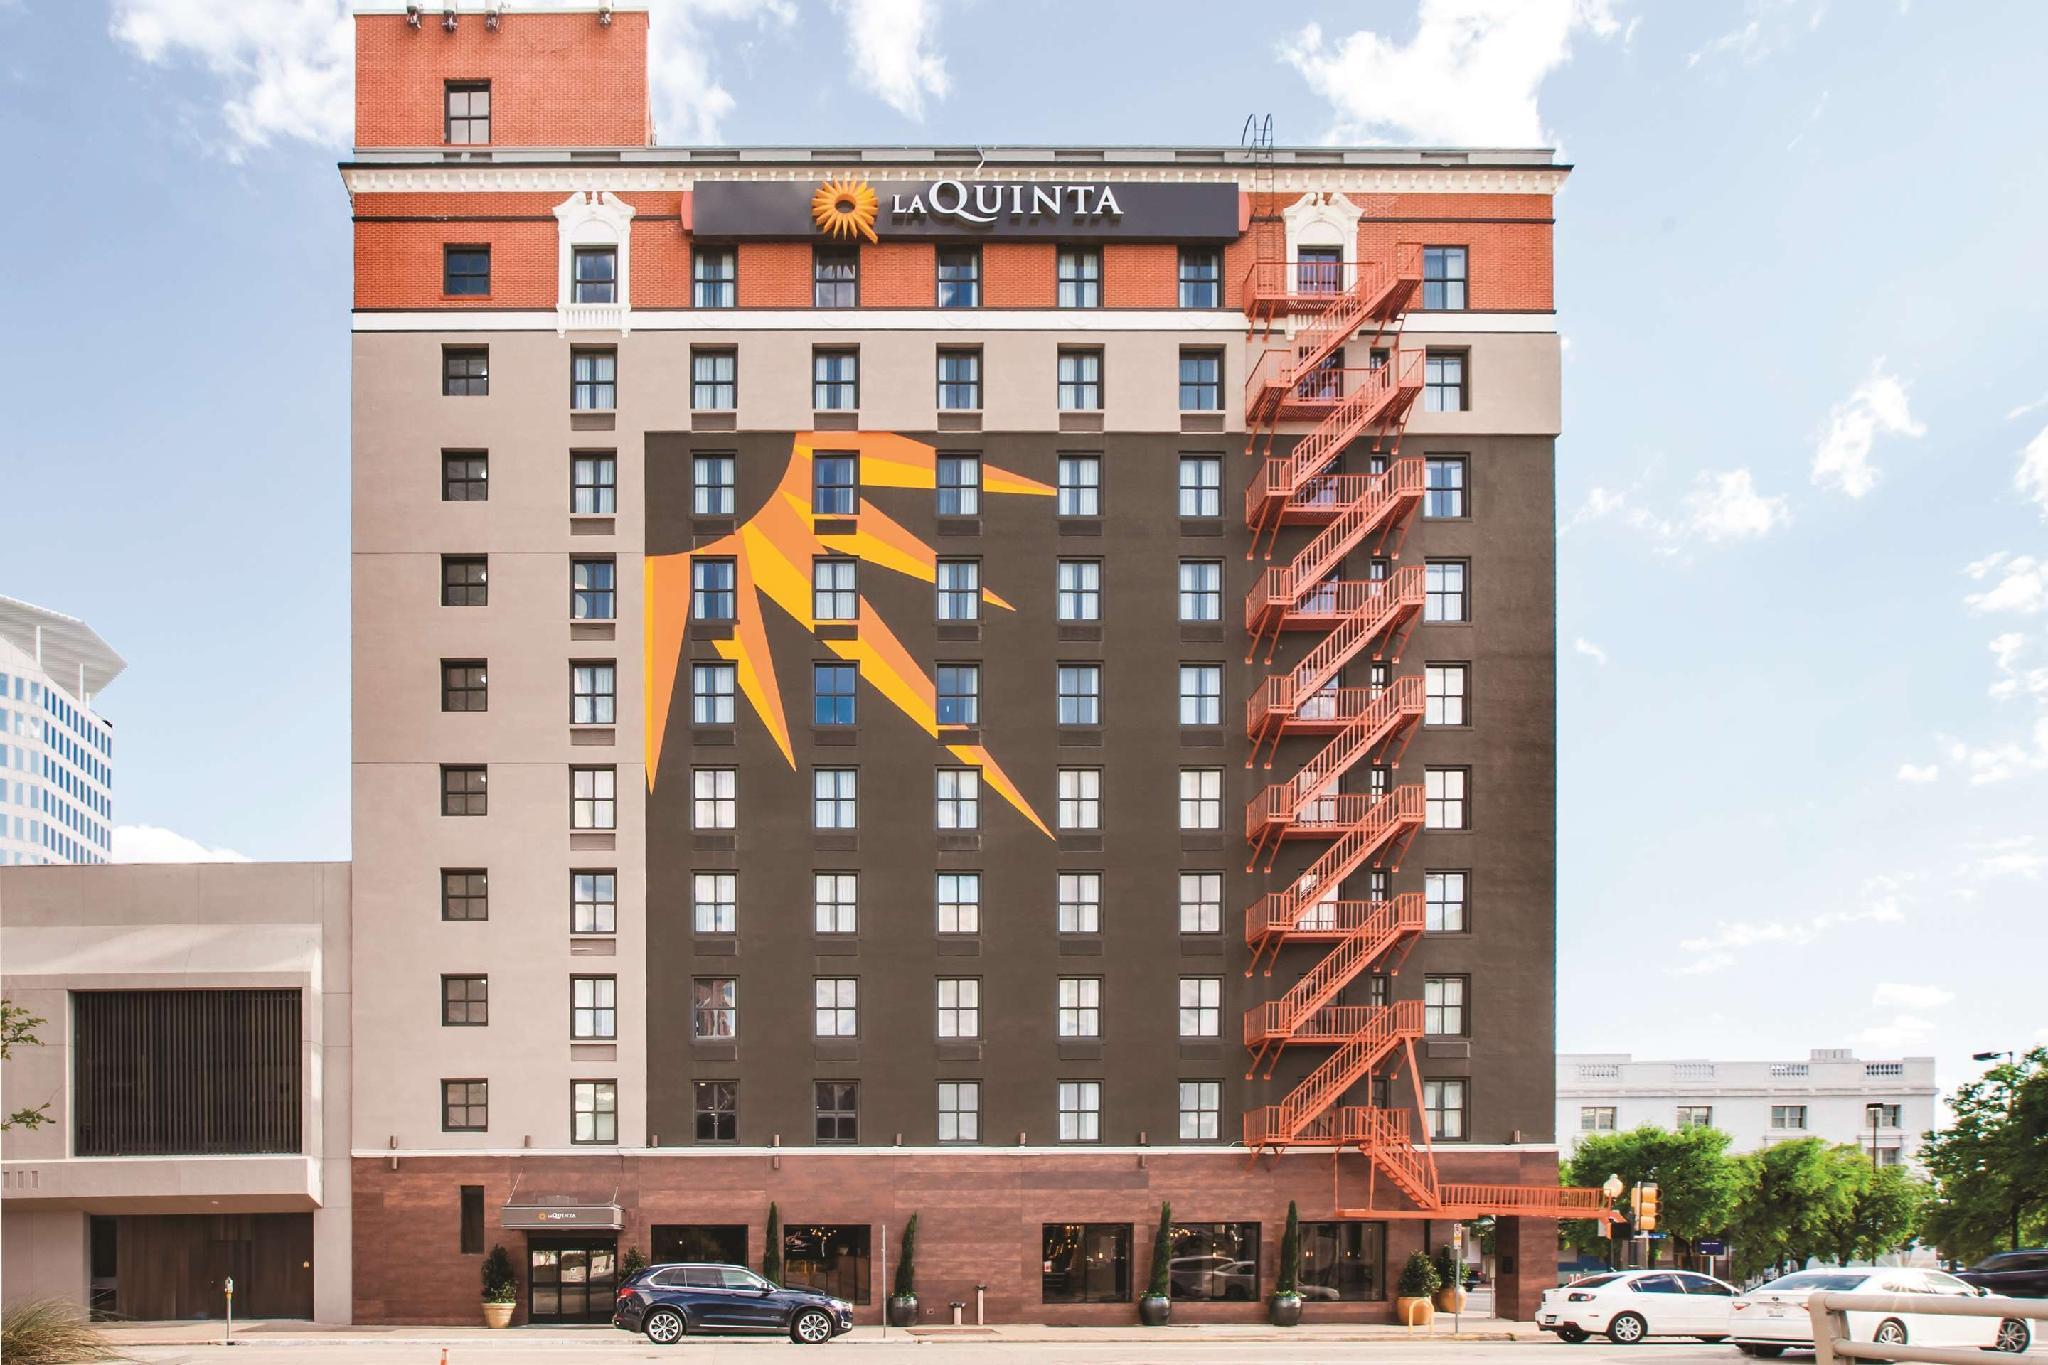 La Quinta Inn And Suites By Wyndham Dallas Downtown